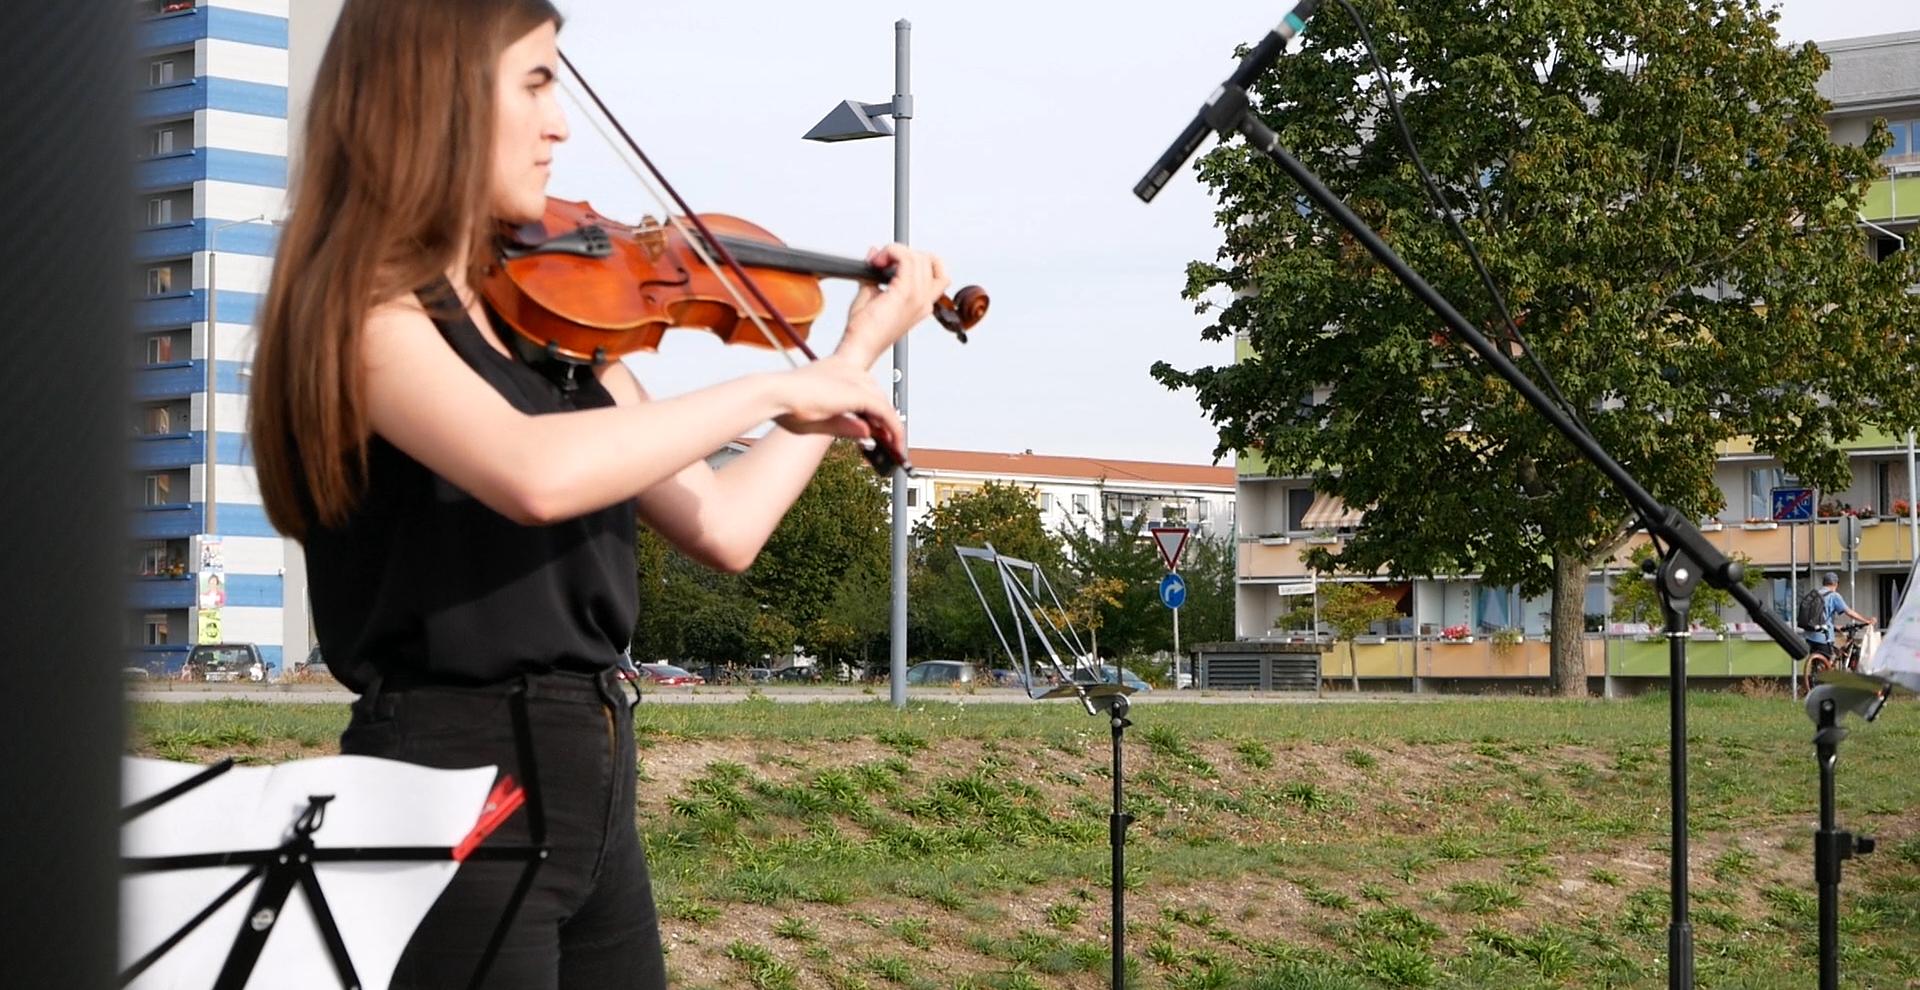 Tag der offenen Musikschule